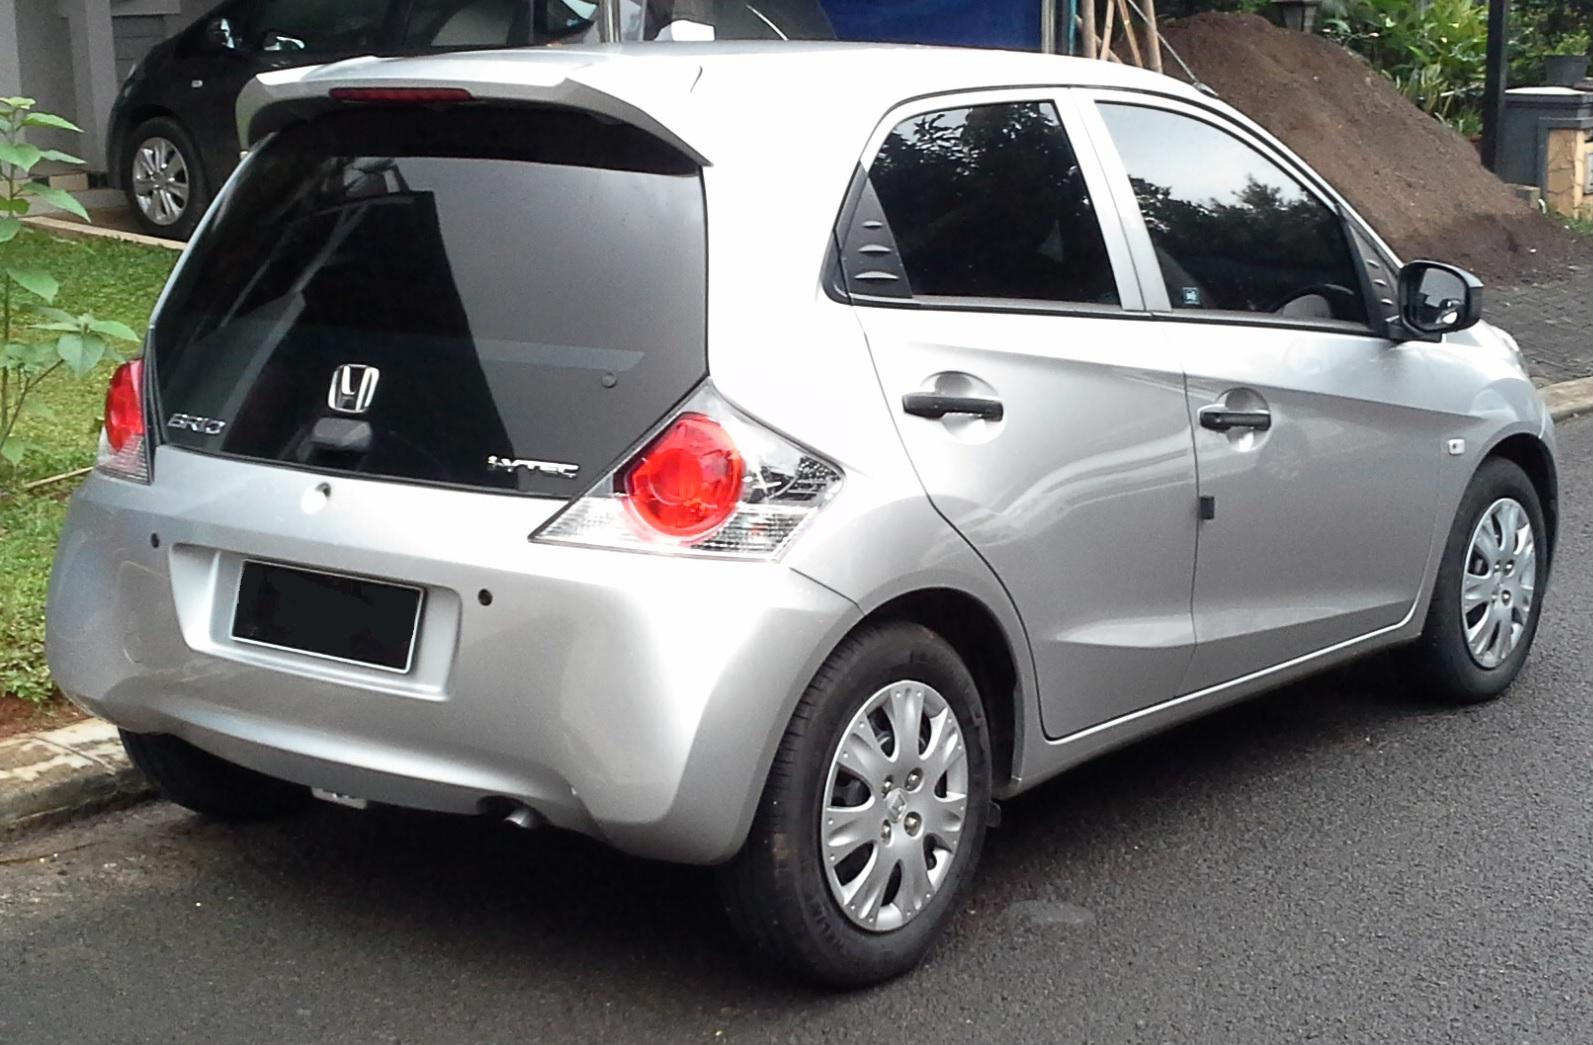 Kia Philippines Price List >> Honda Brio Vs Mitsubishi Mirage | Autos Post